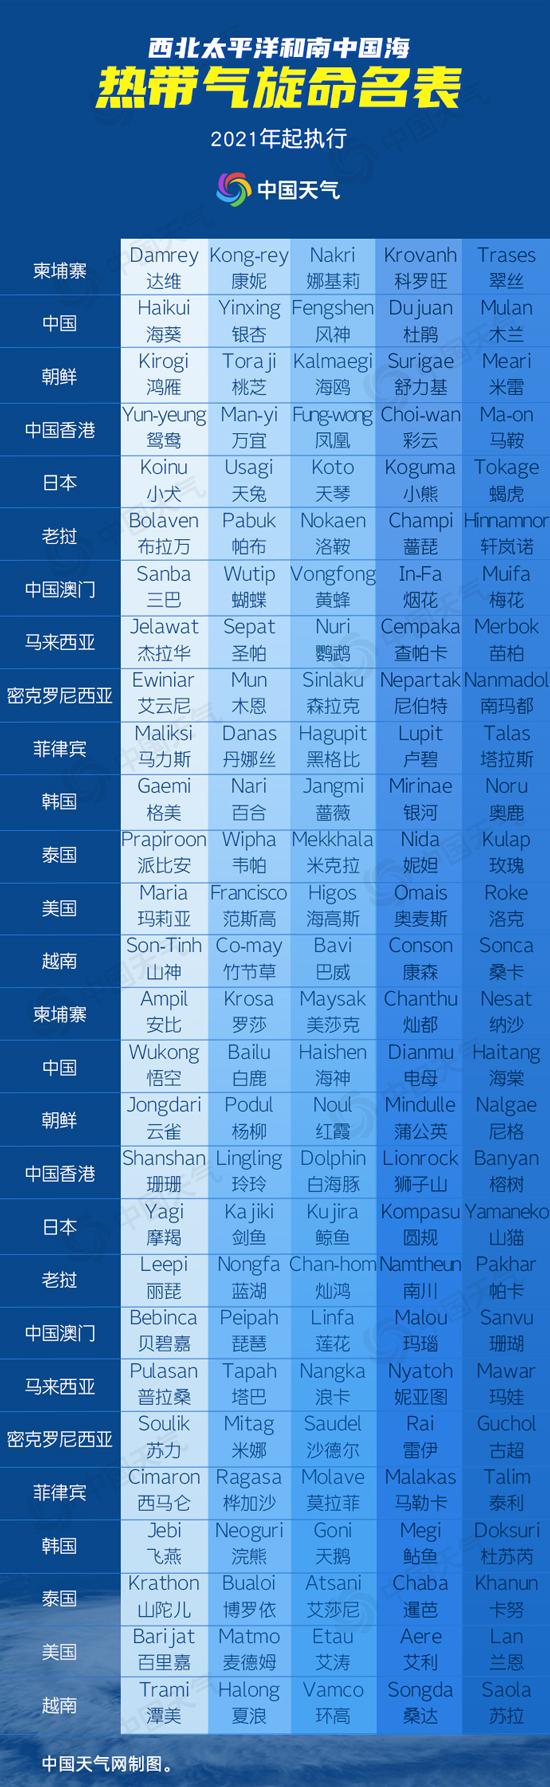 http://i.weather.com.cn/images/heilongjiang/gdt/2021/09/08/7AB7A50A3E4B3F2C1D83B0AD2B811027.jpg